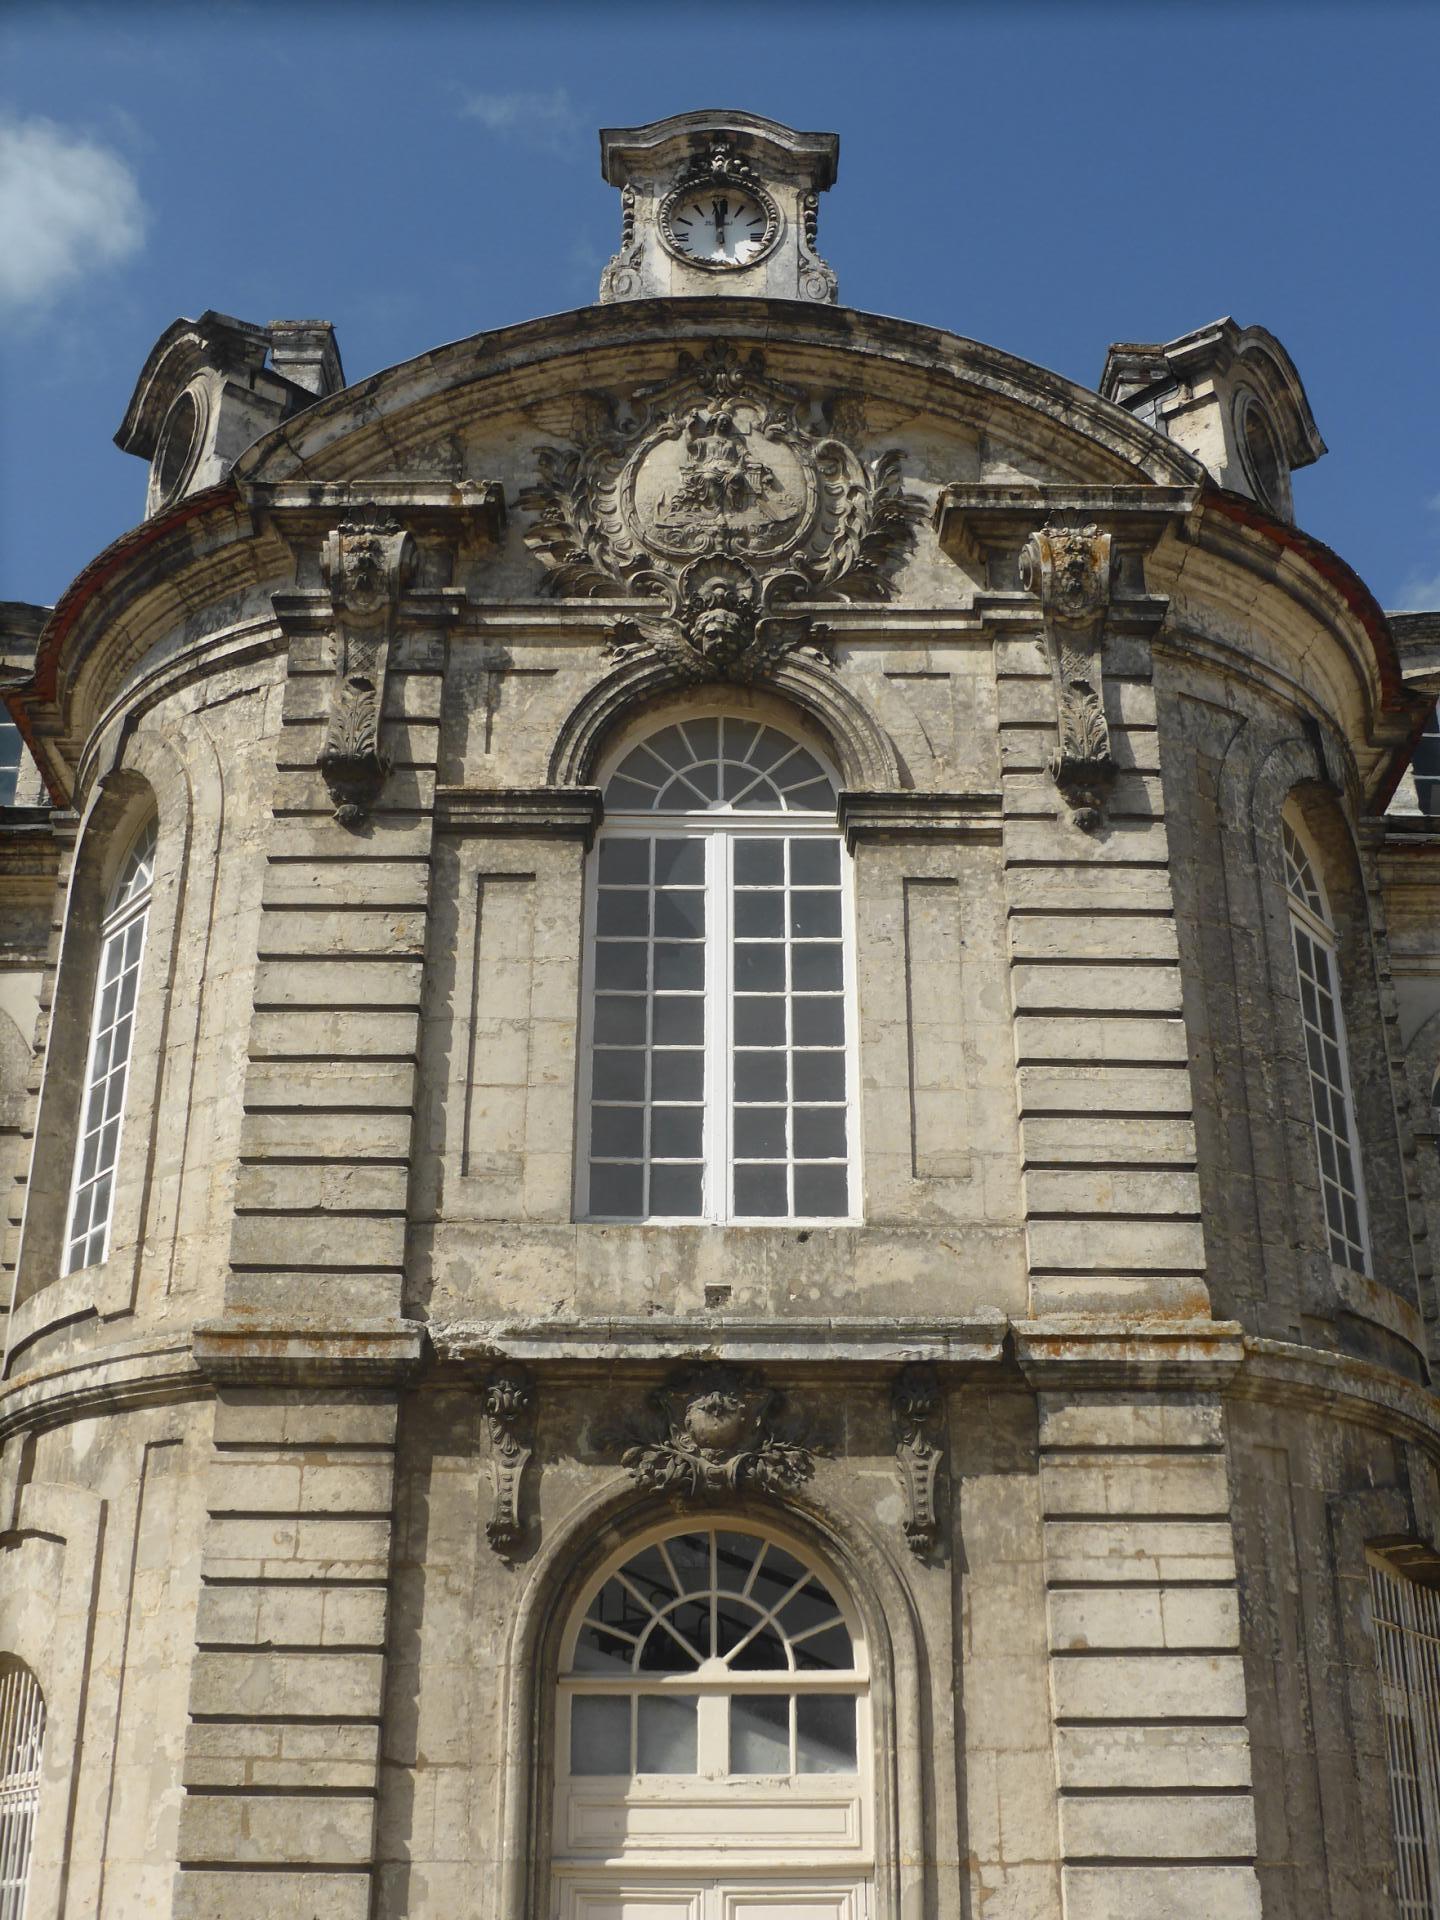 Châteaudun, Hôtel-Dieu, avant-corps central, milieu XVIIIe, cl. Ph. Cachau